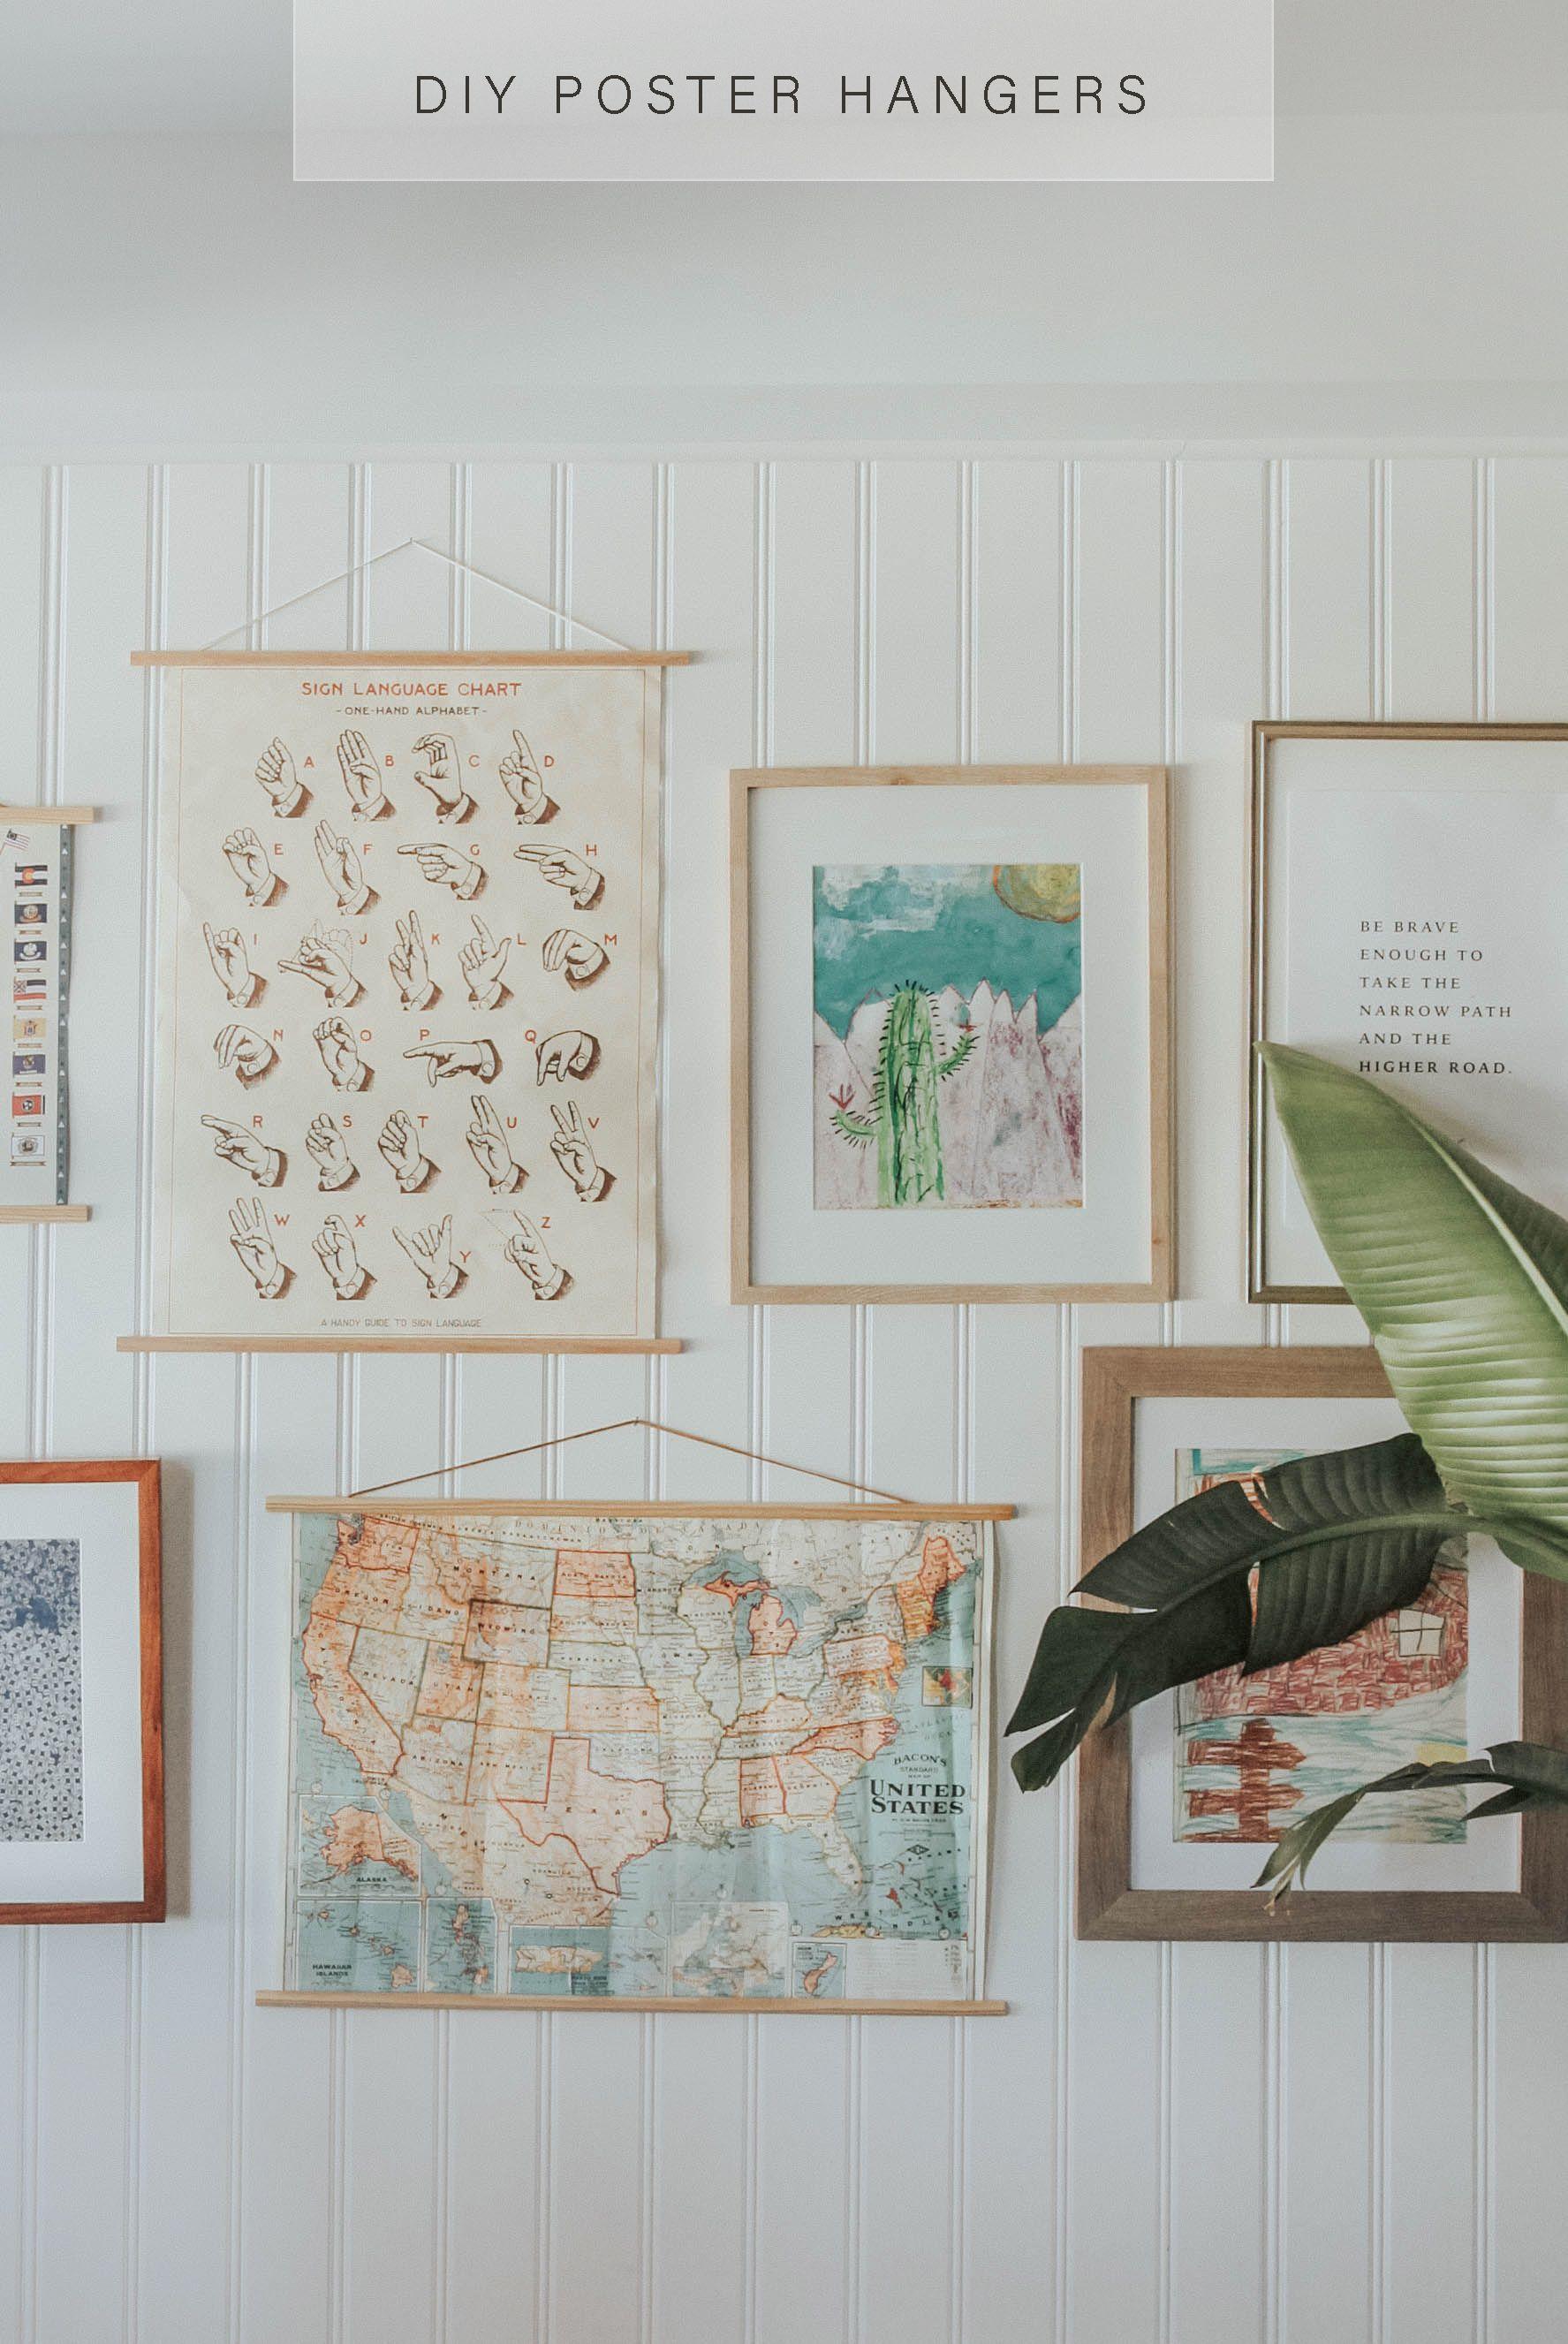 DIY Poster Hangers in 3 steps.